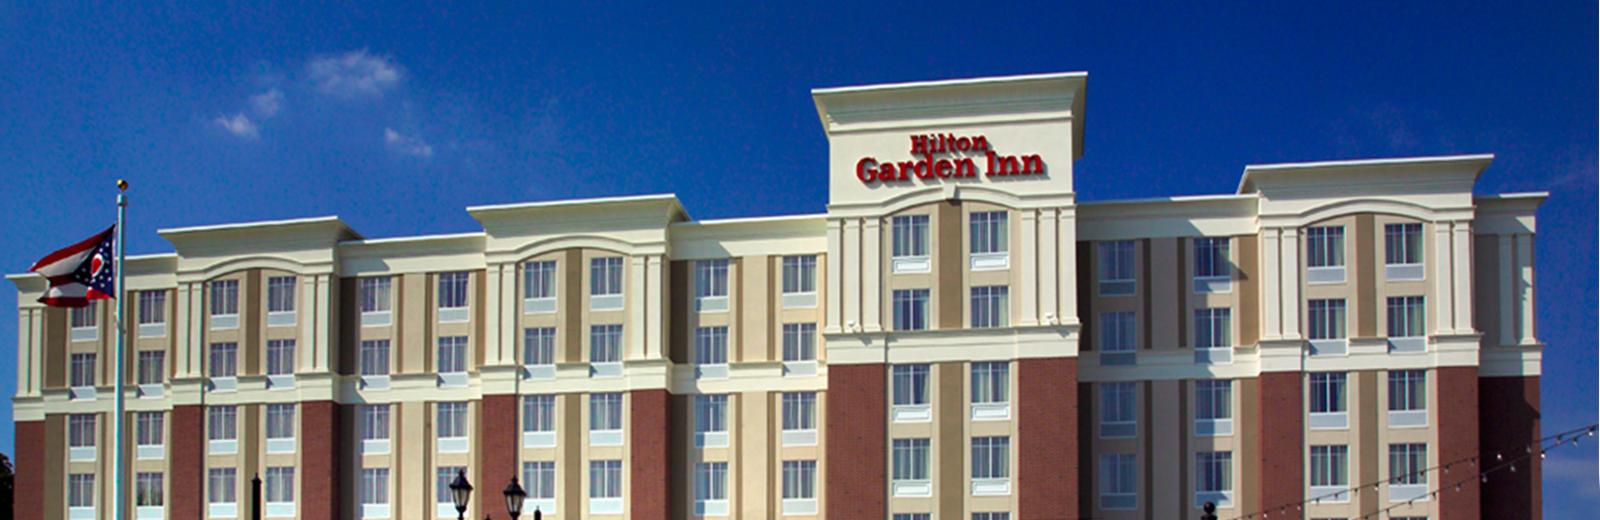 Hilton Garden Inn Projects Rudolph Libbe Group